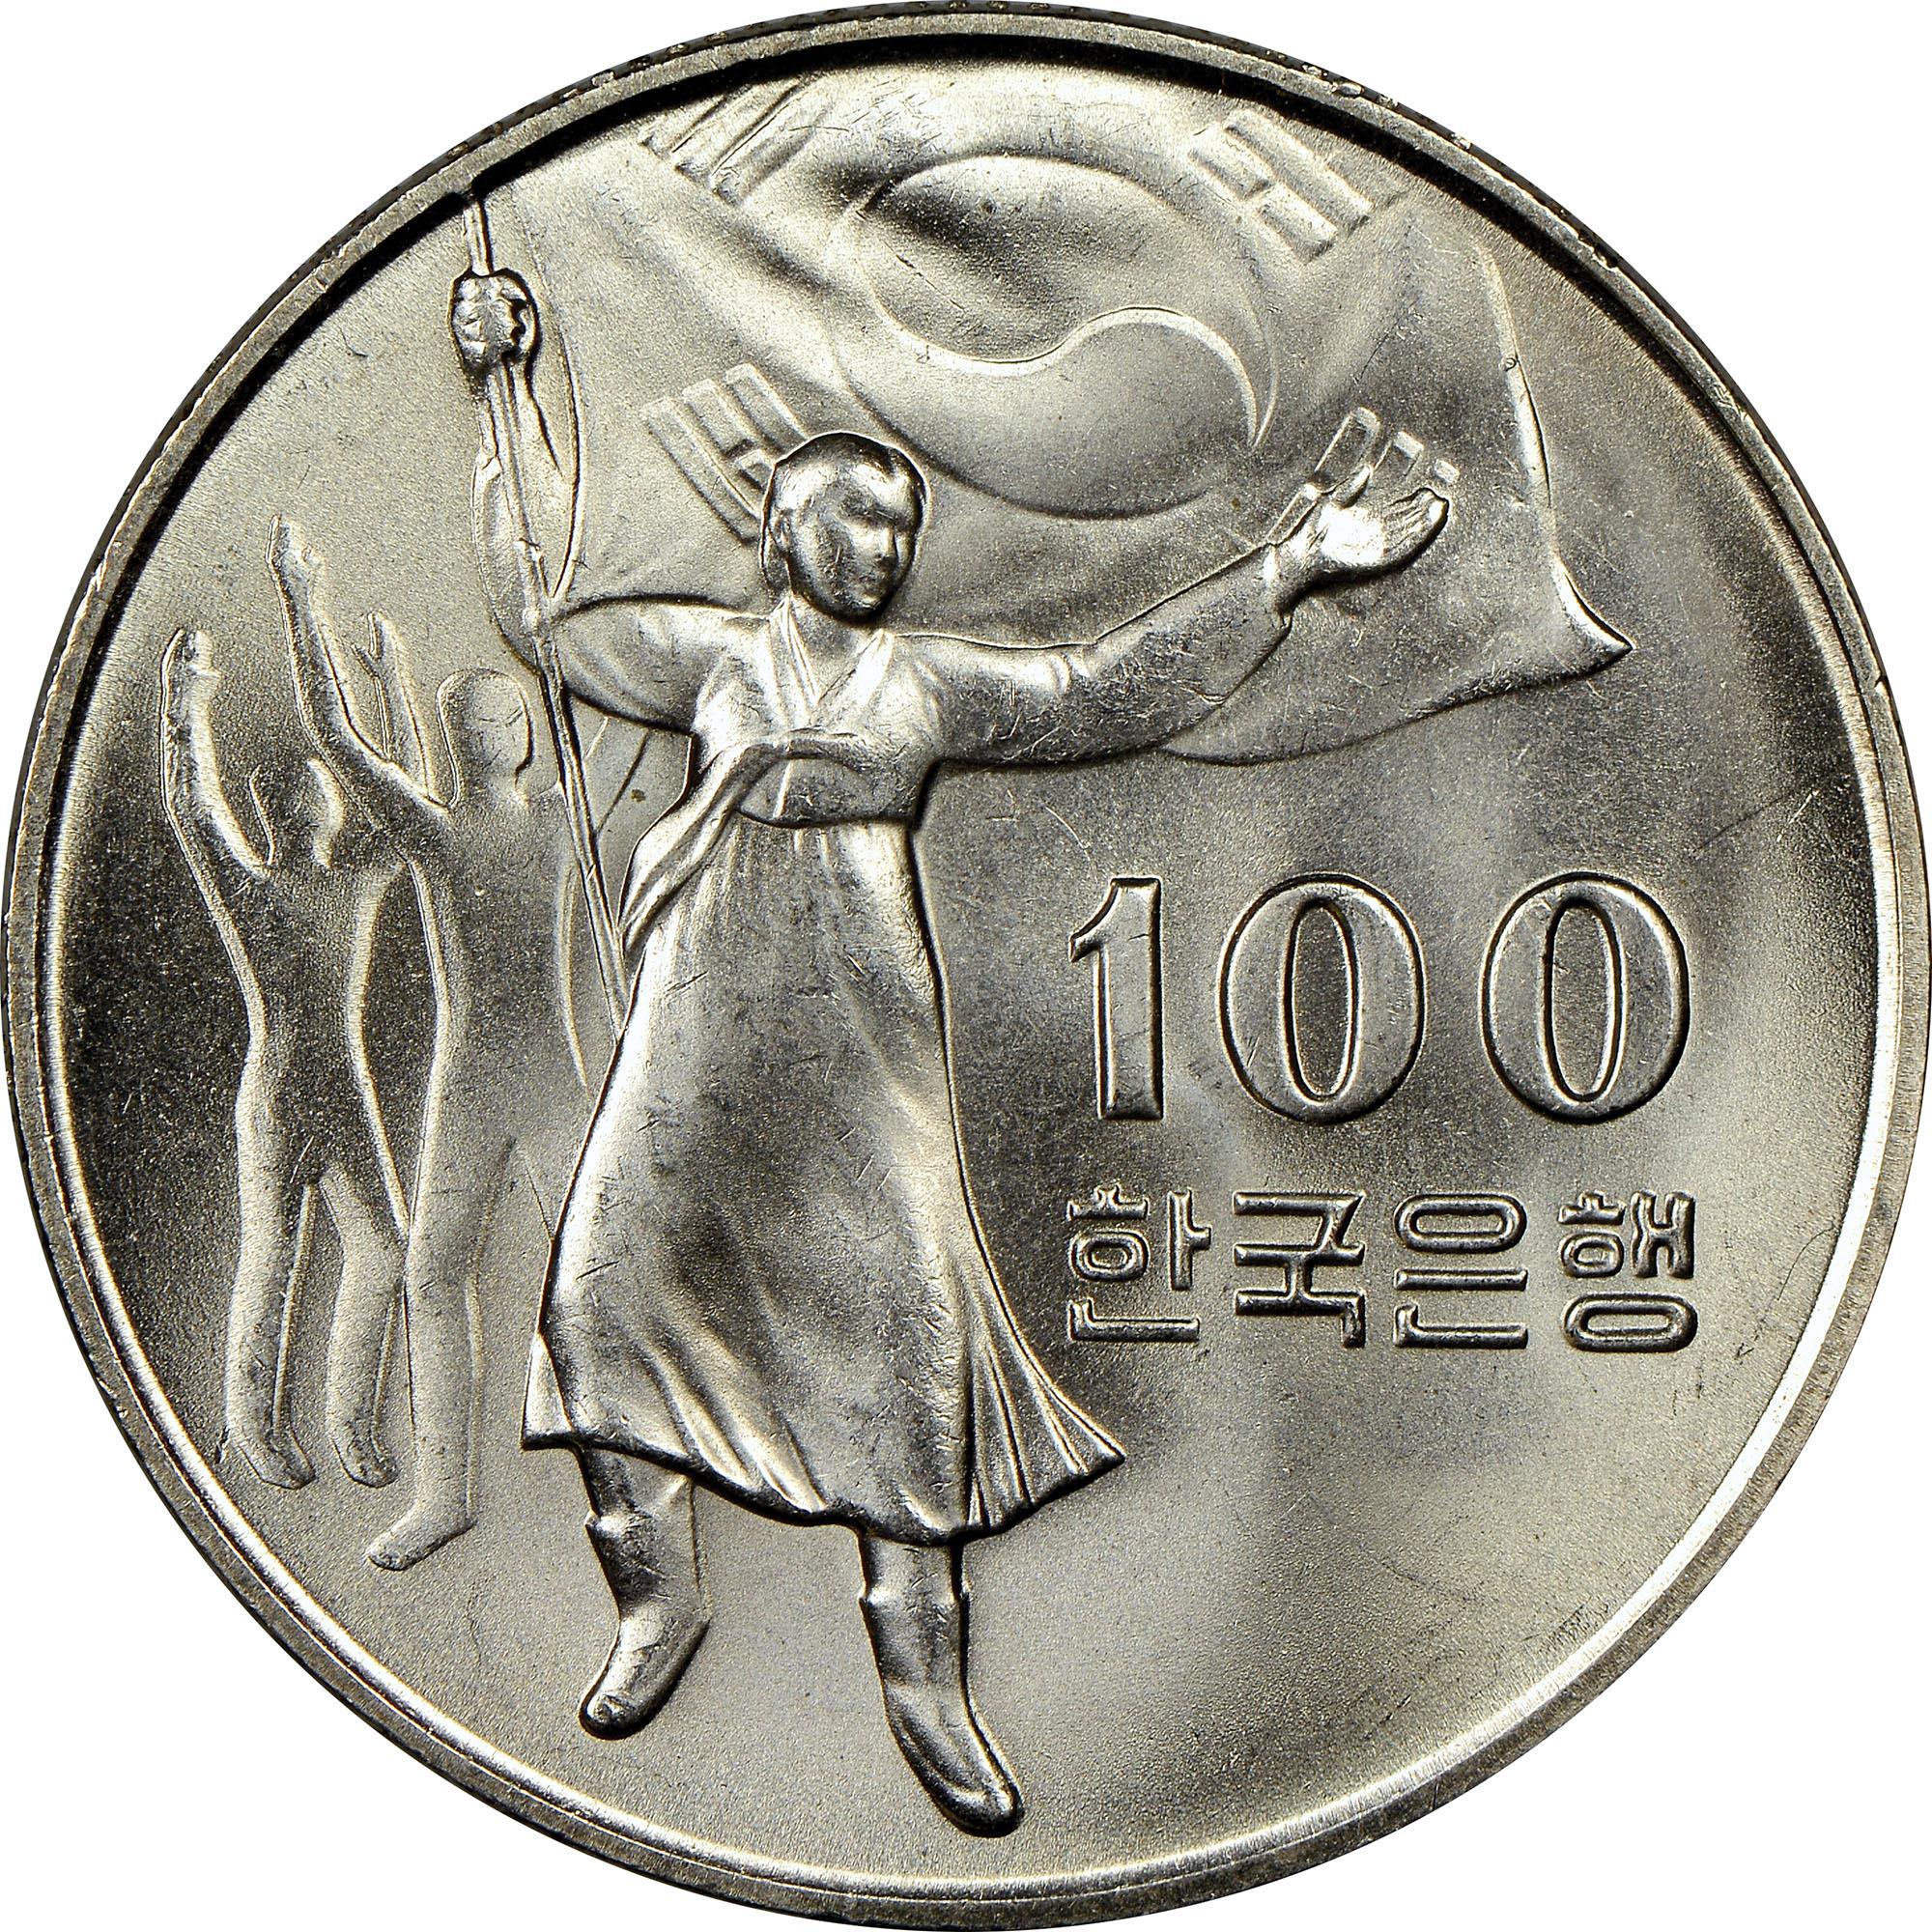 Korean coins 100 worth / Oceanlab ico inc news